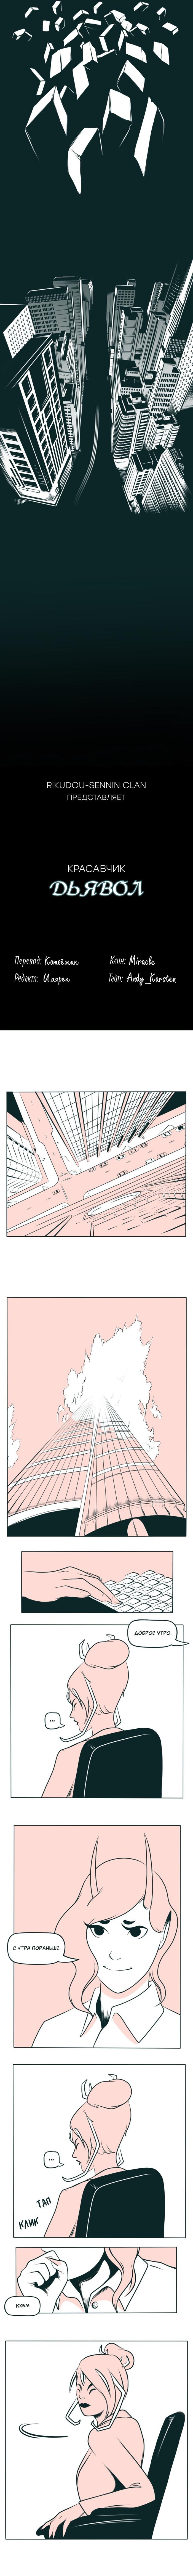 https://r1.ninemanga.com/comics/pic2/0/33536/420904/1534437543908.jpg Page 3